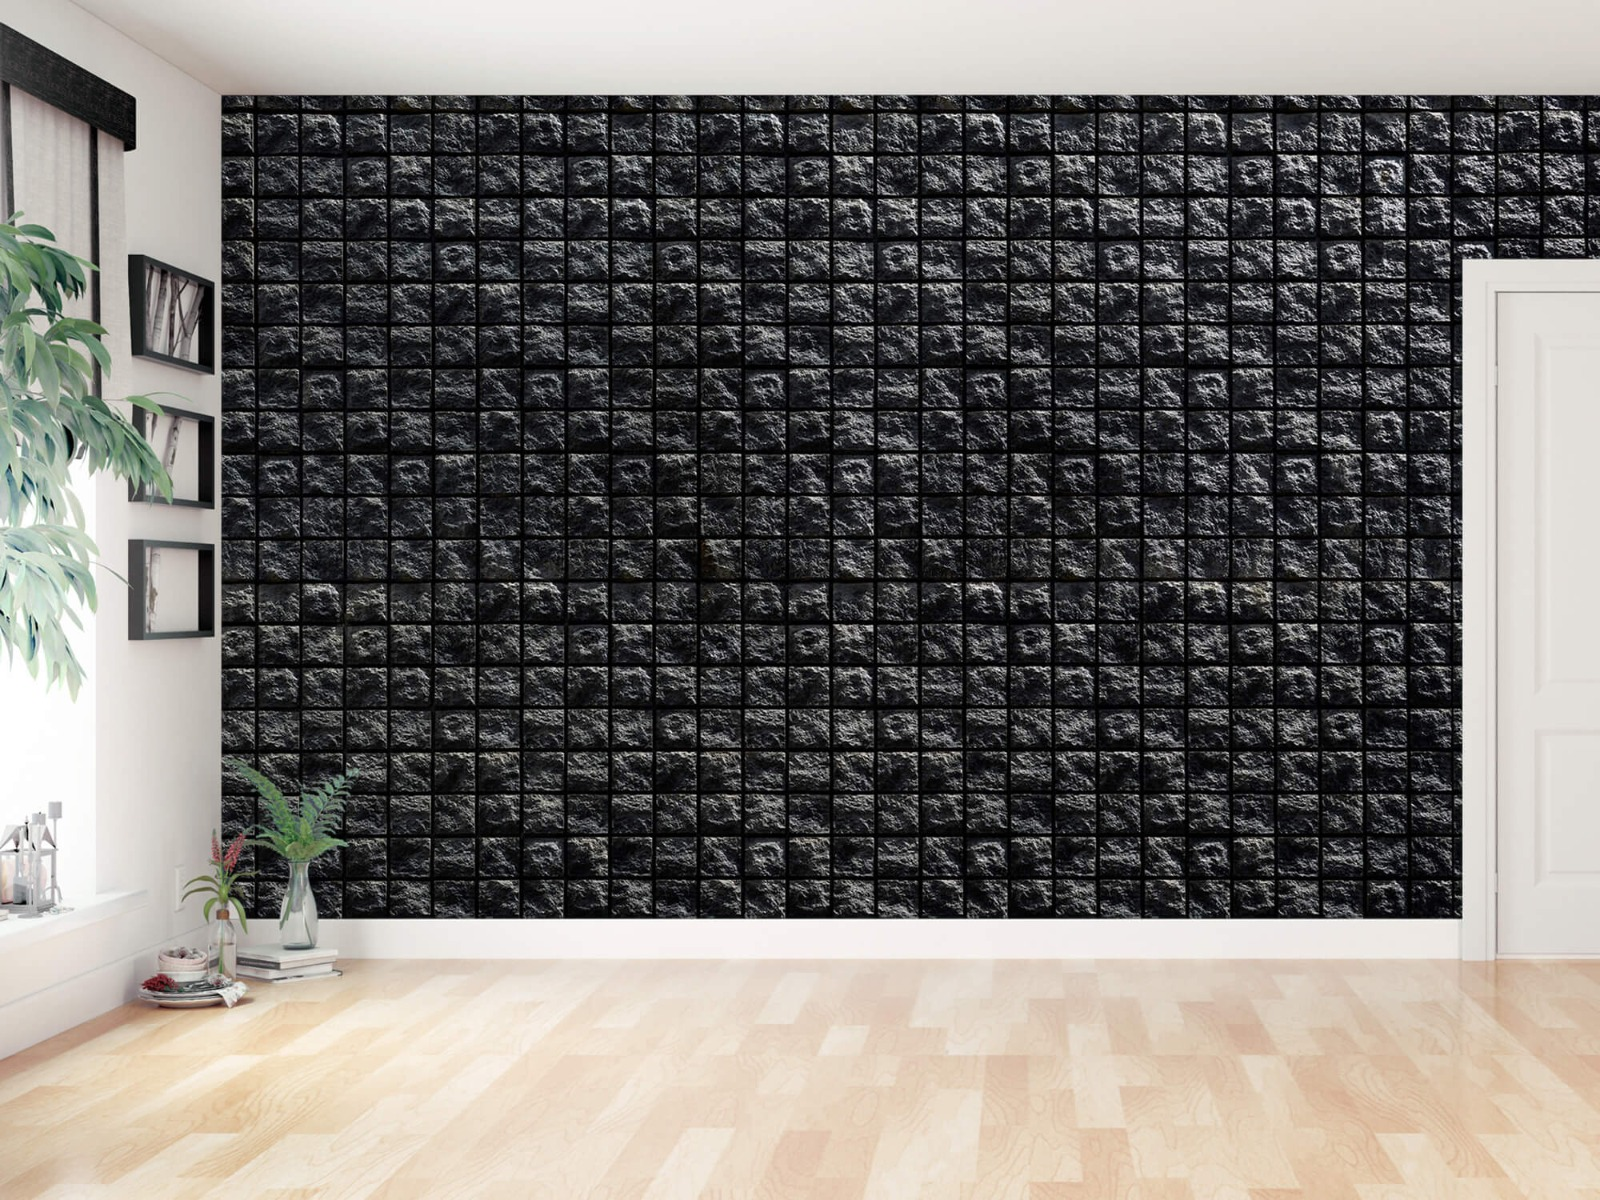 Tegel behang - Vierkante zwarte stenen - Wallexclusive - Woonkamer 11